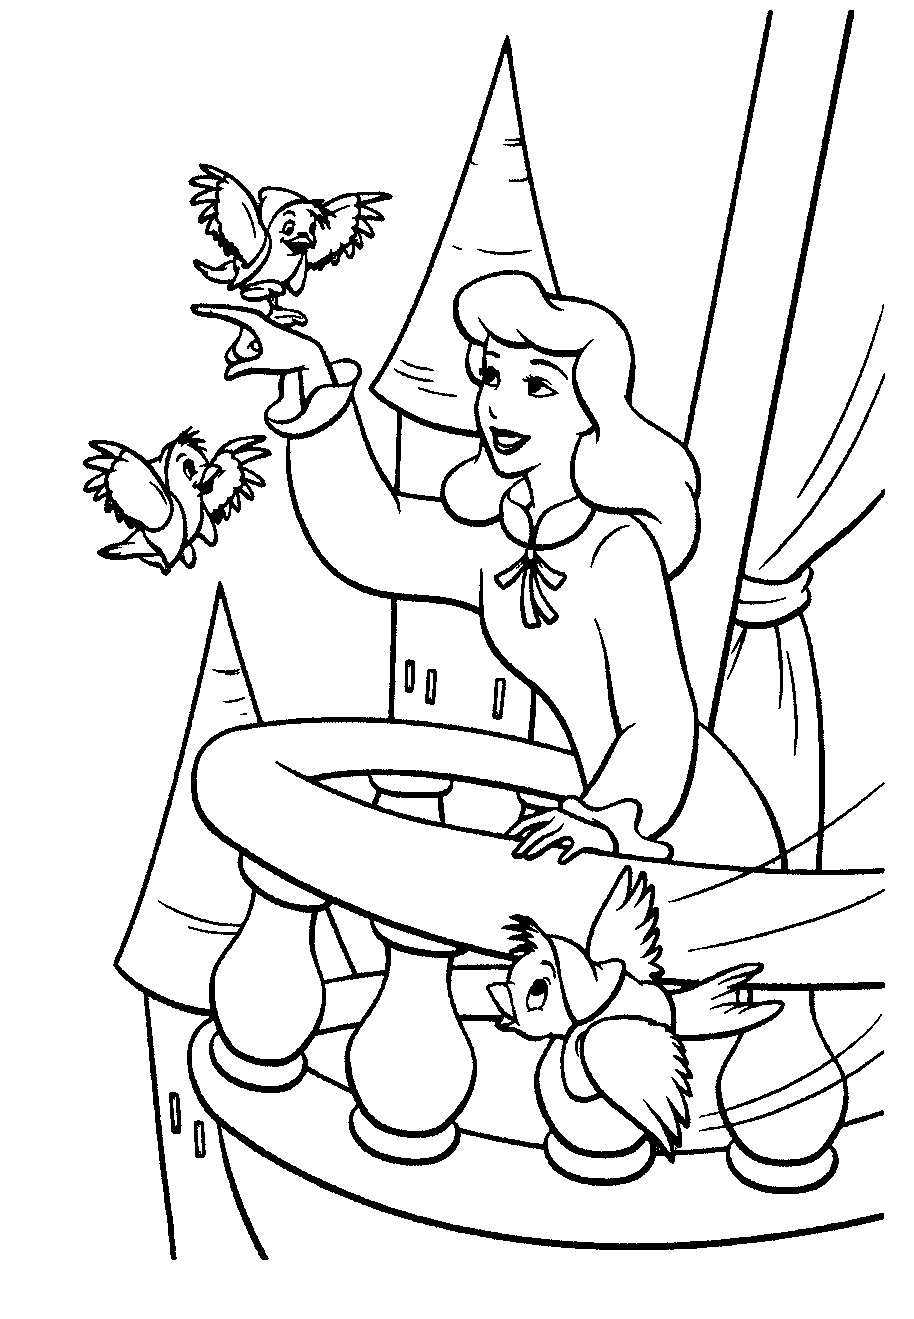 cinderella coloring page cinderella coloring pages to print cinderella coloring page